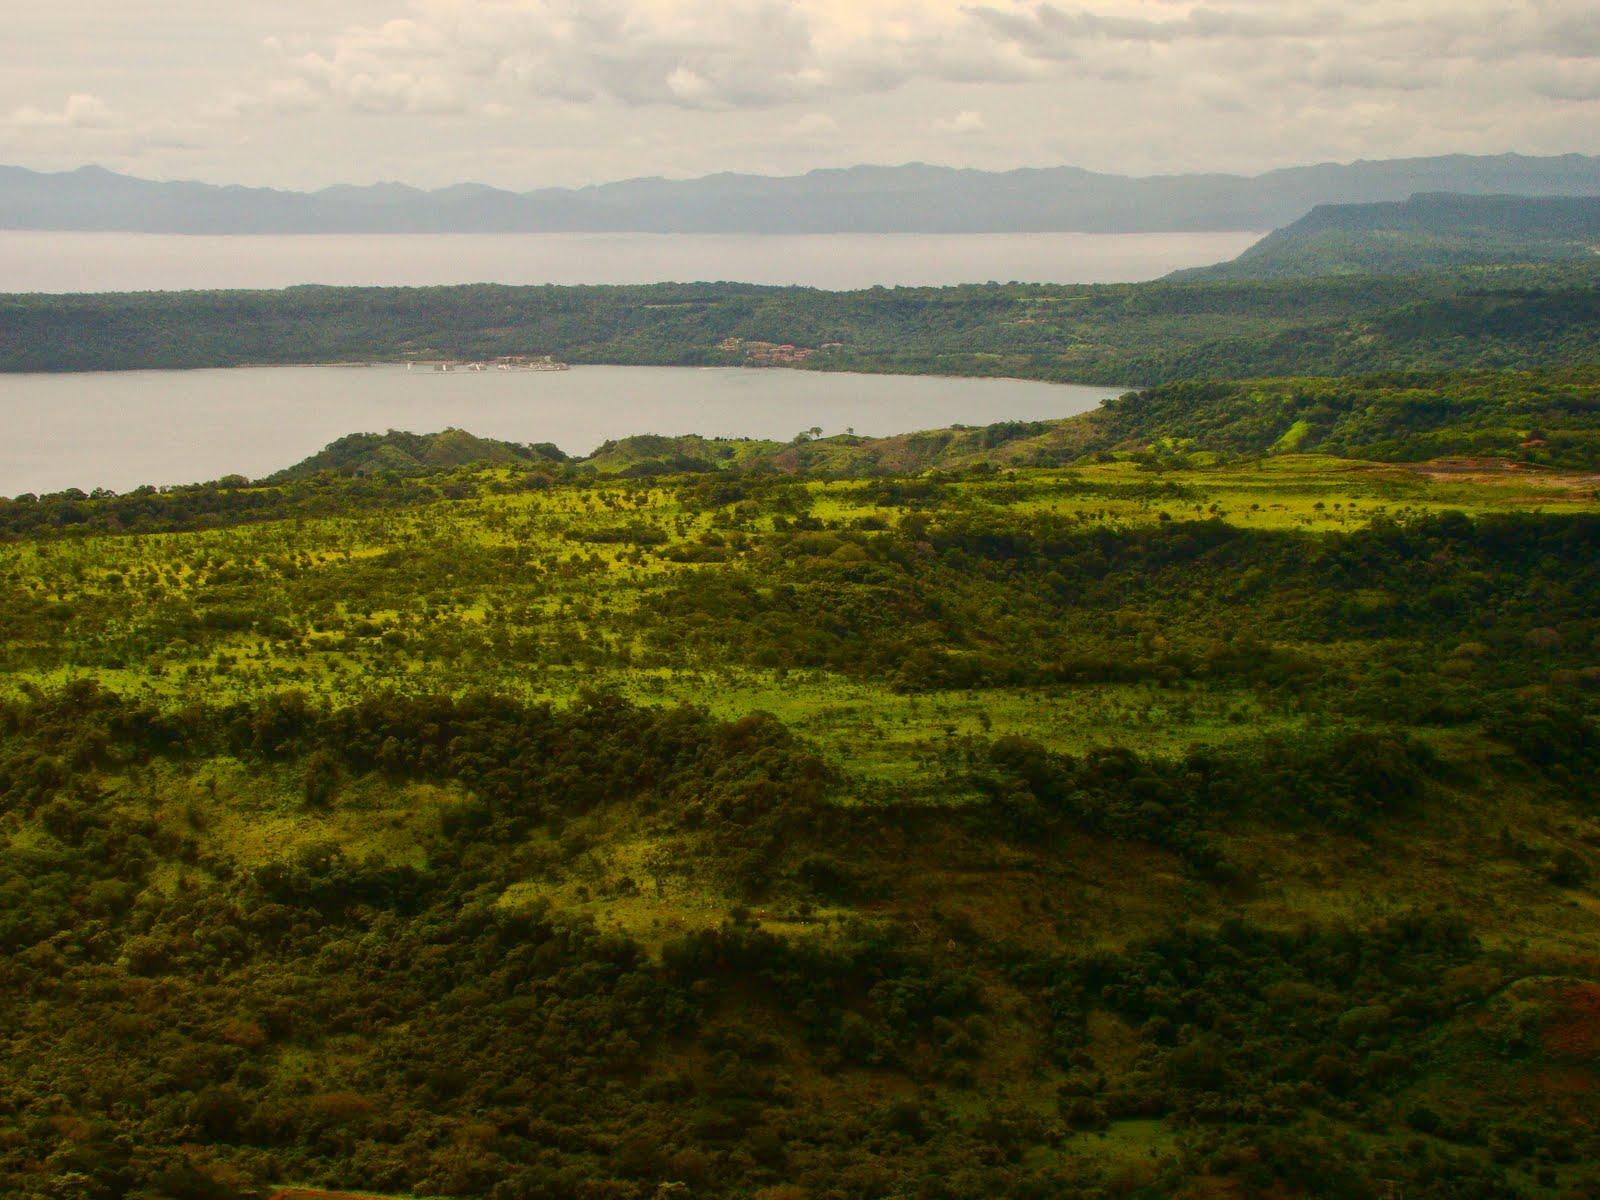 Liberia Photos: Liberian Scenery